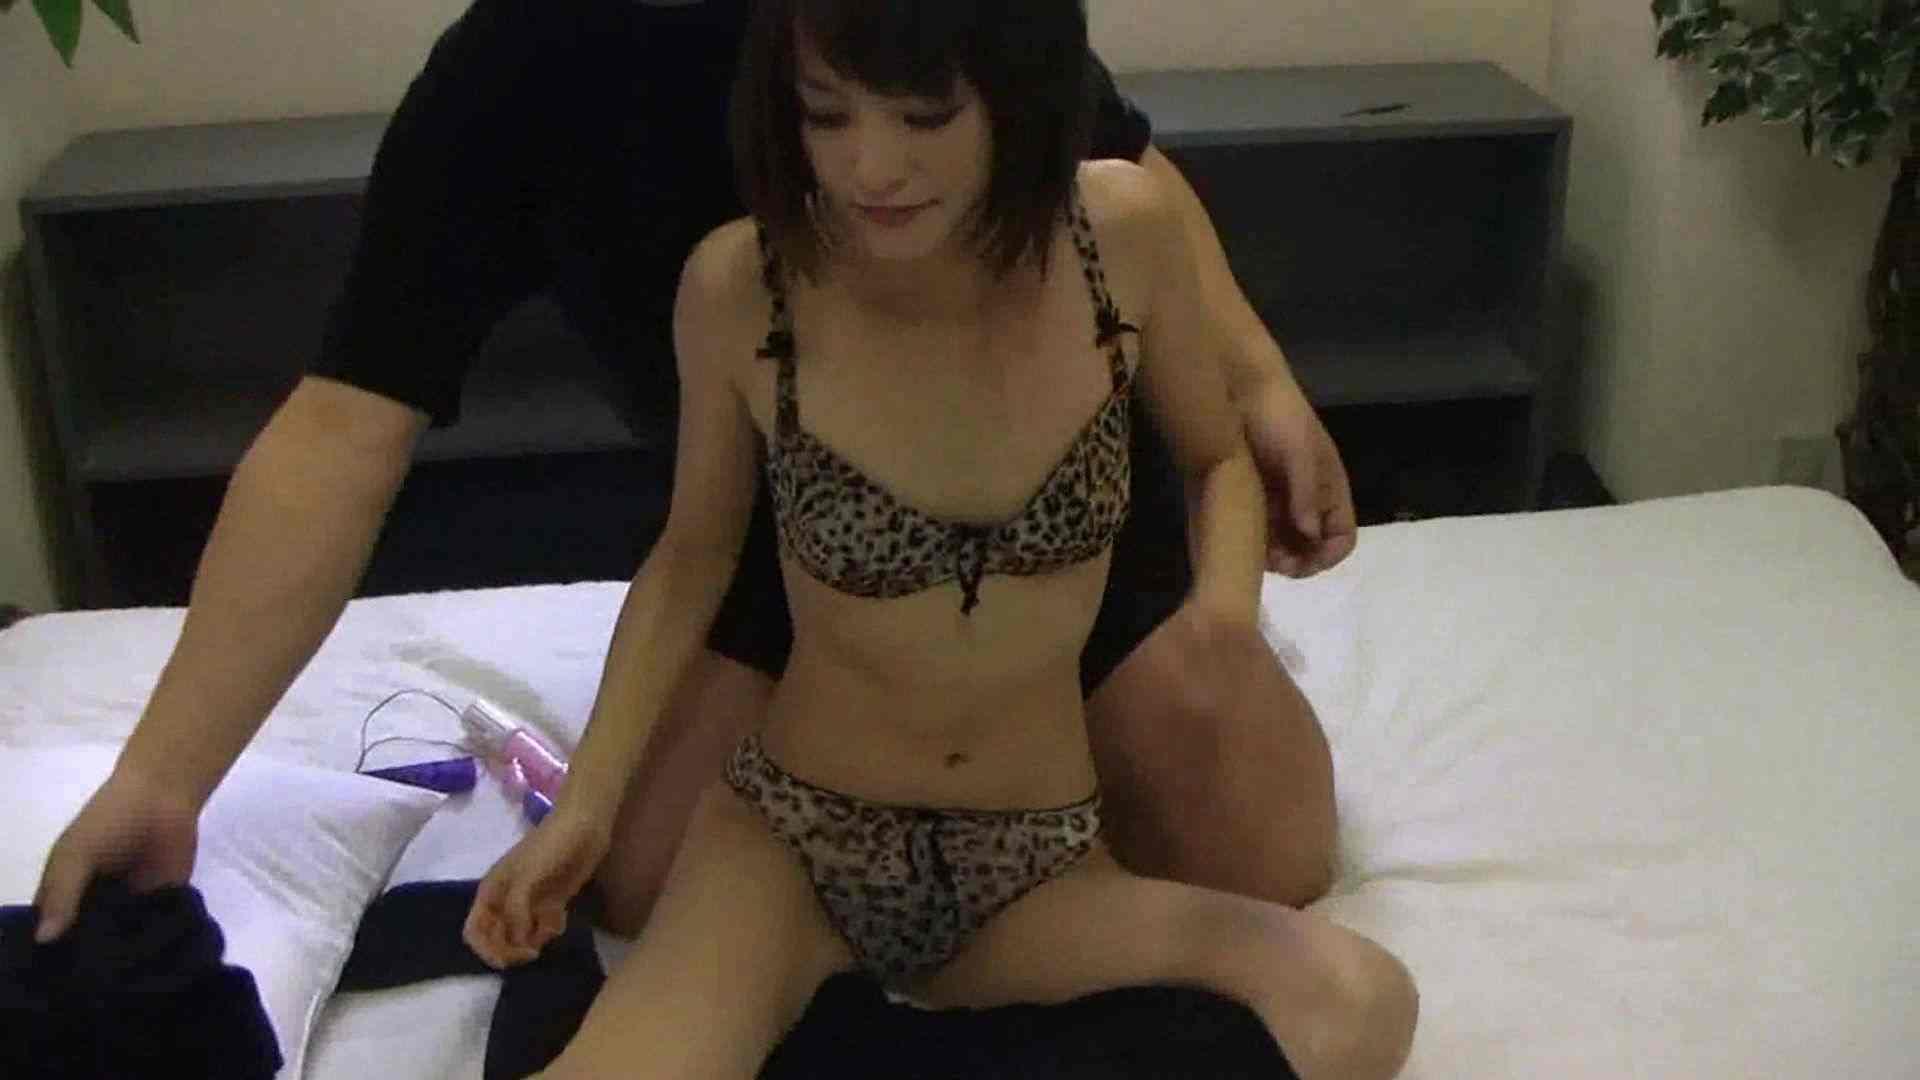 S級厳選美女ビッチガールVol.26 ギャルの実態 | 貧乳  78pic 33